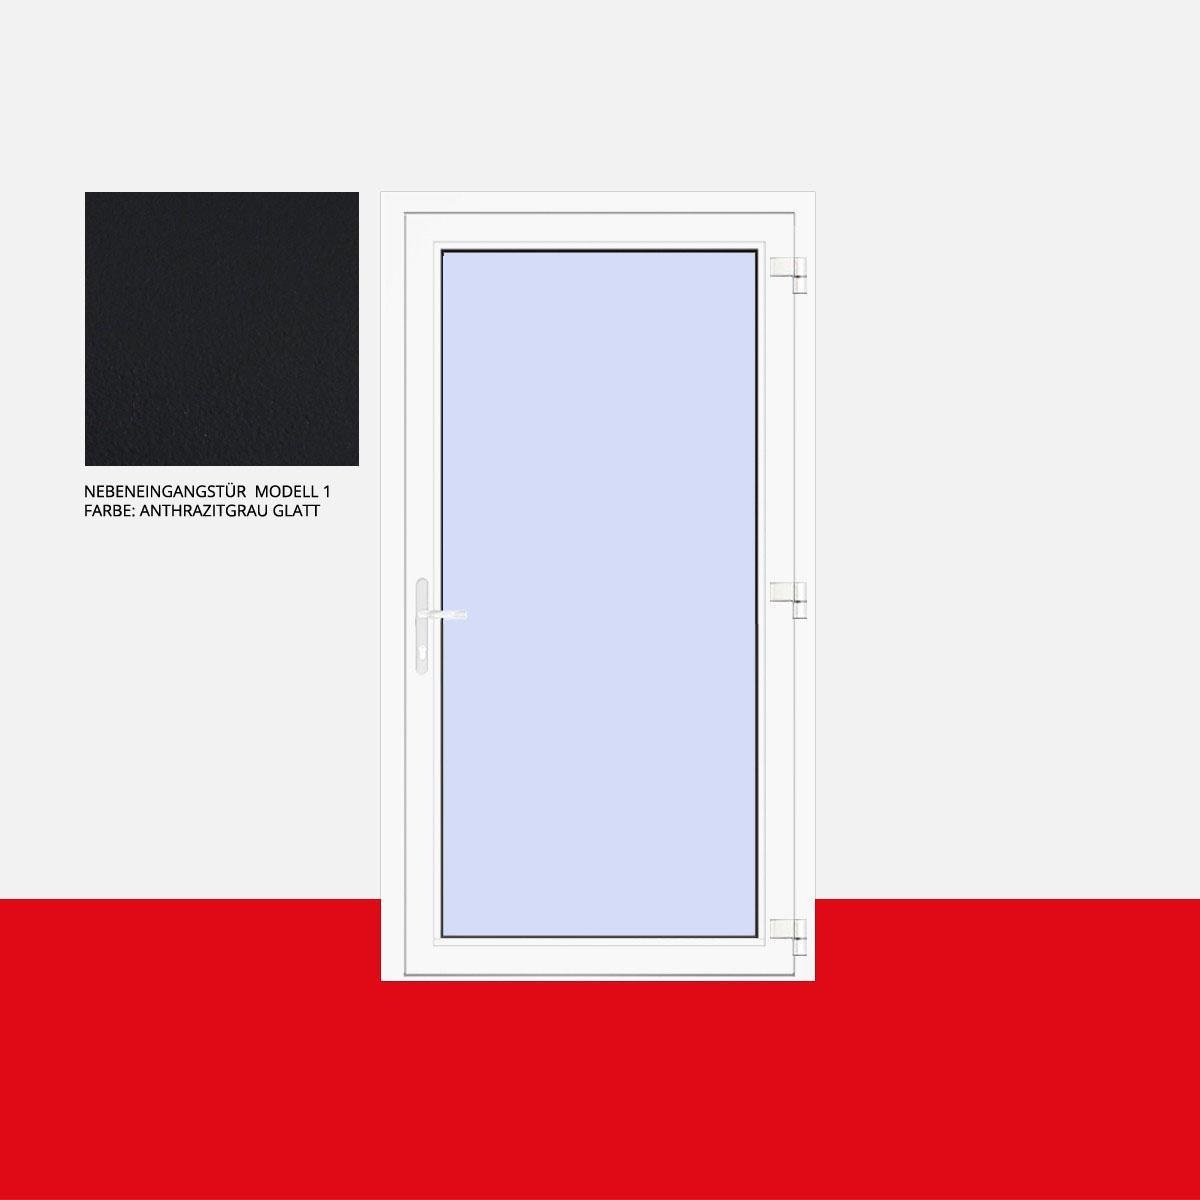 Nebeneingangstür Modell 1 Anthrazitgrau Glatt